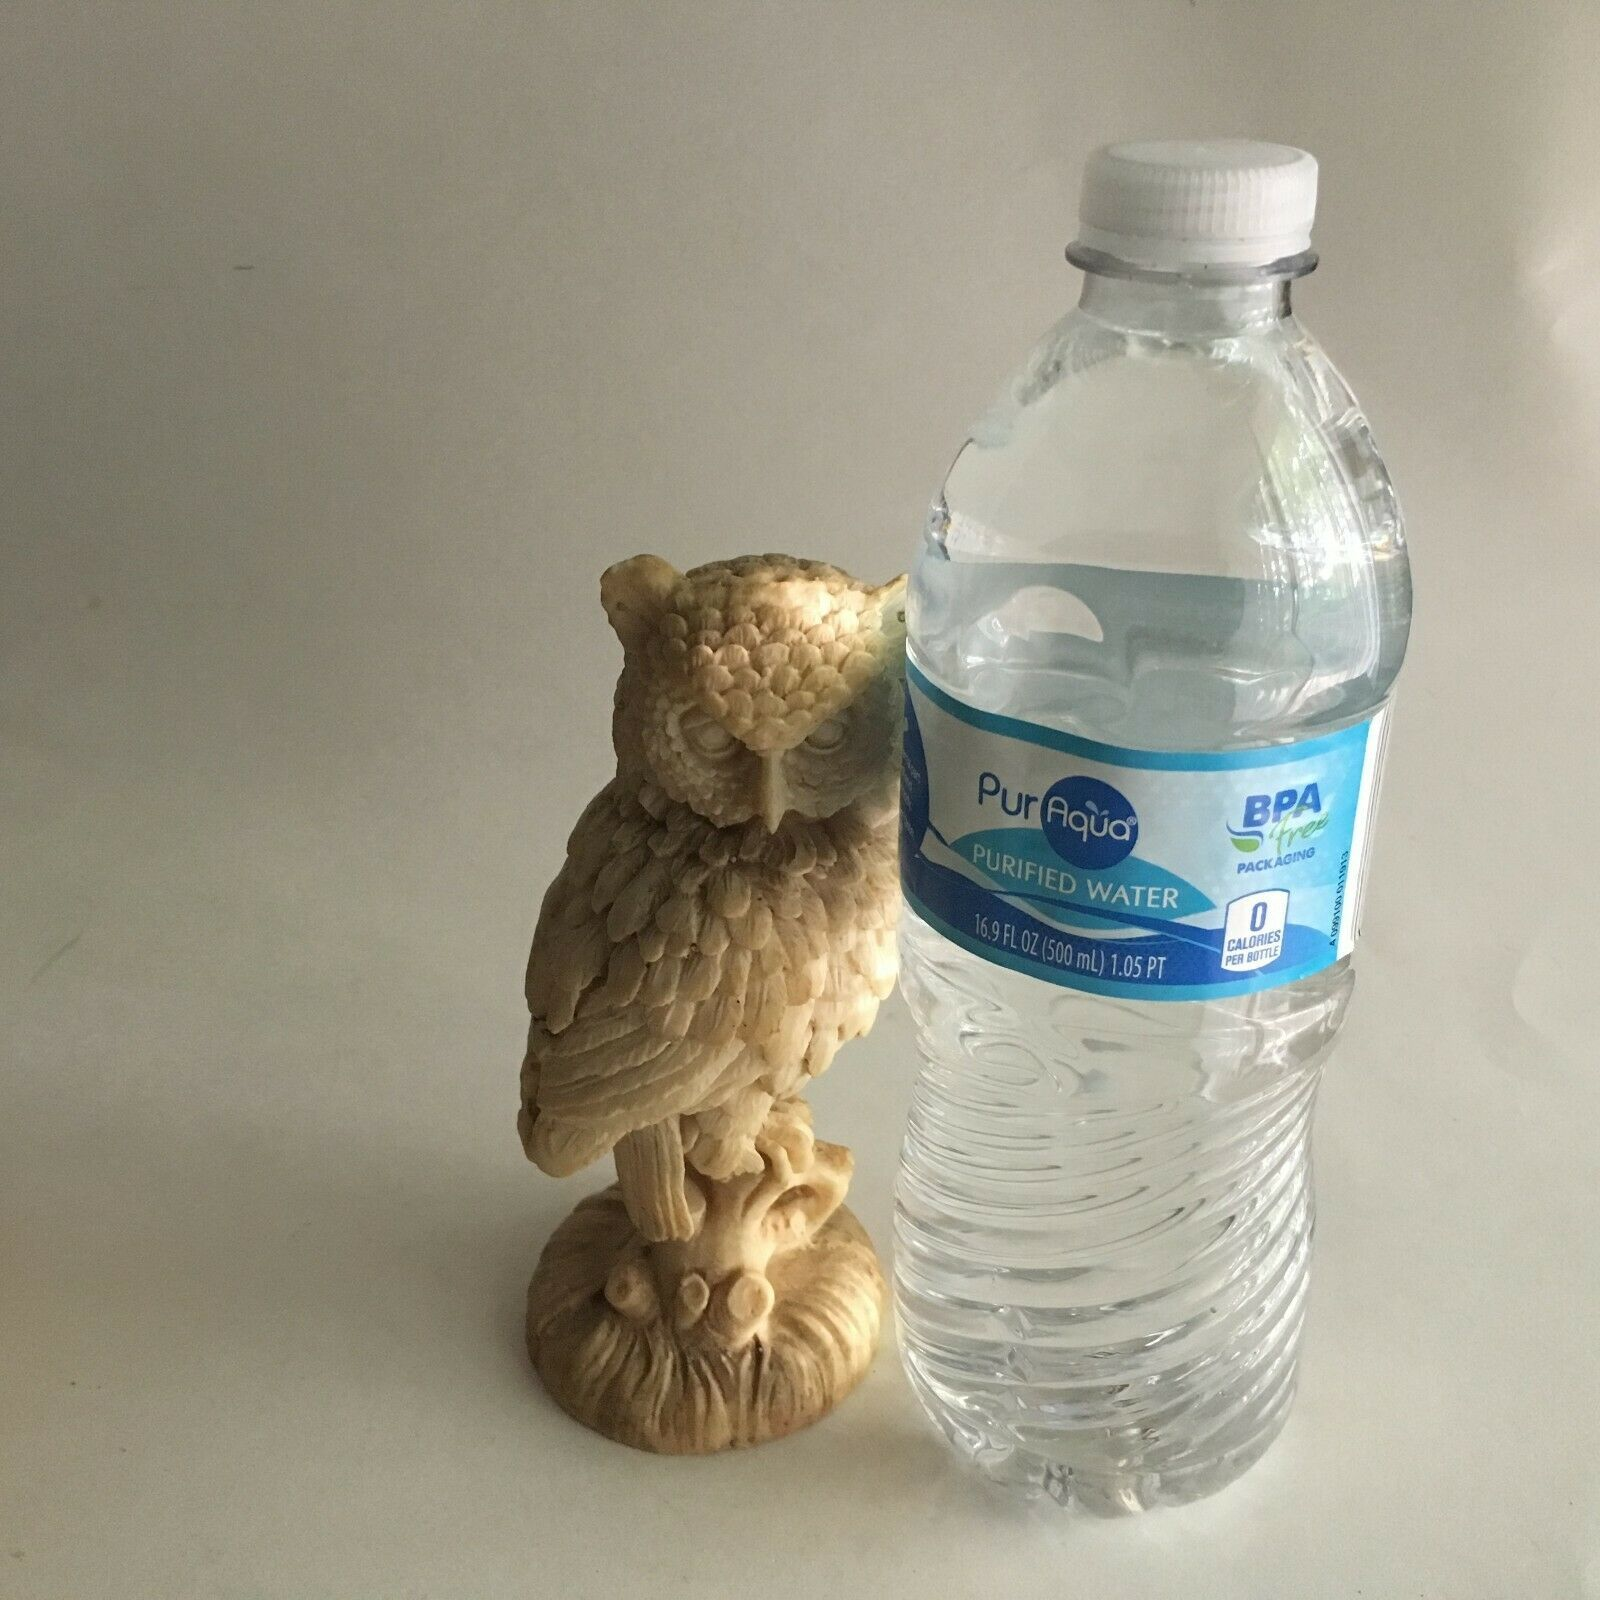 "Owl Figurine Composite/Resin Statue 5.5"" Tall Intricate Design Animal"